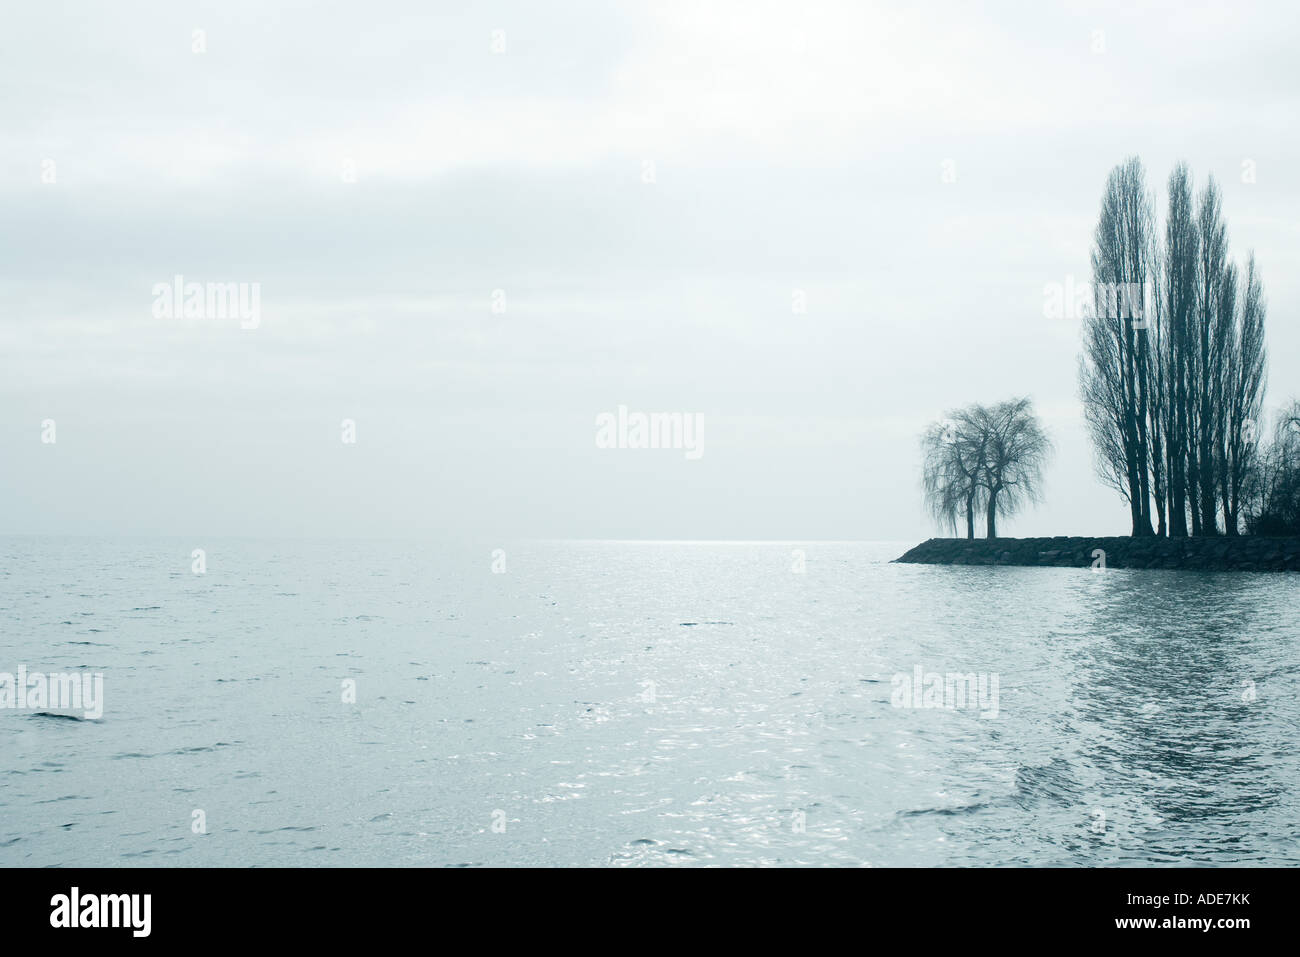 Lakescape - Stock Image